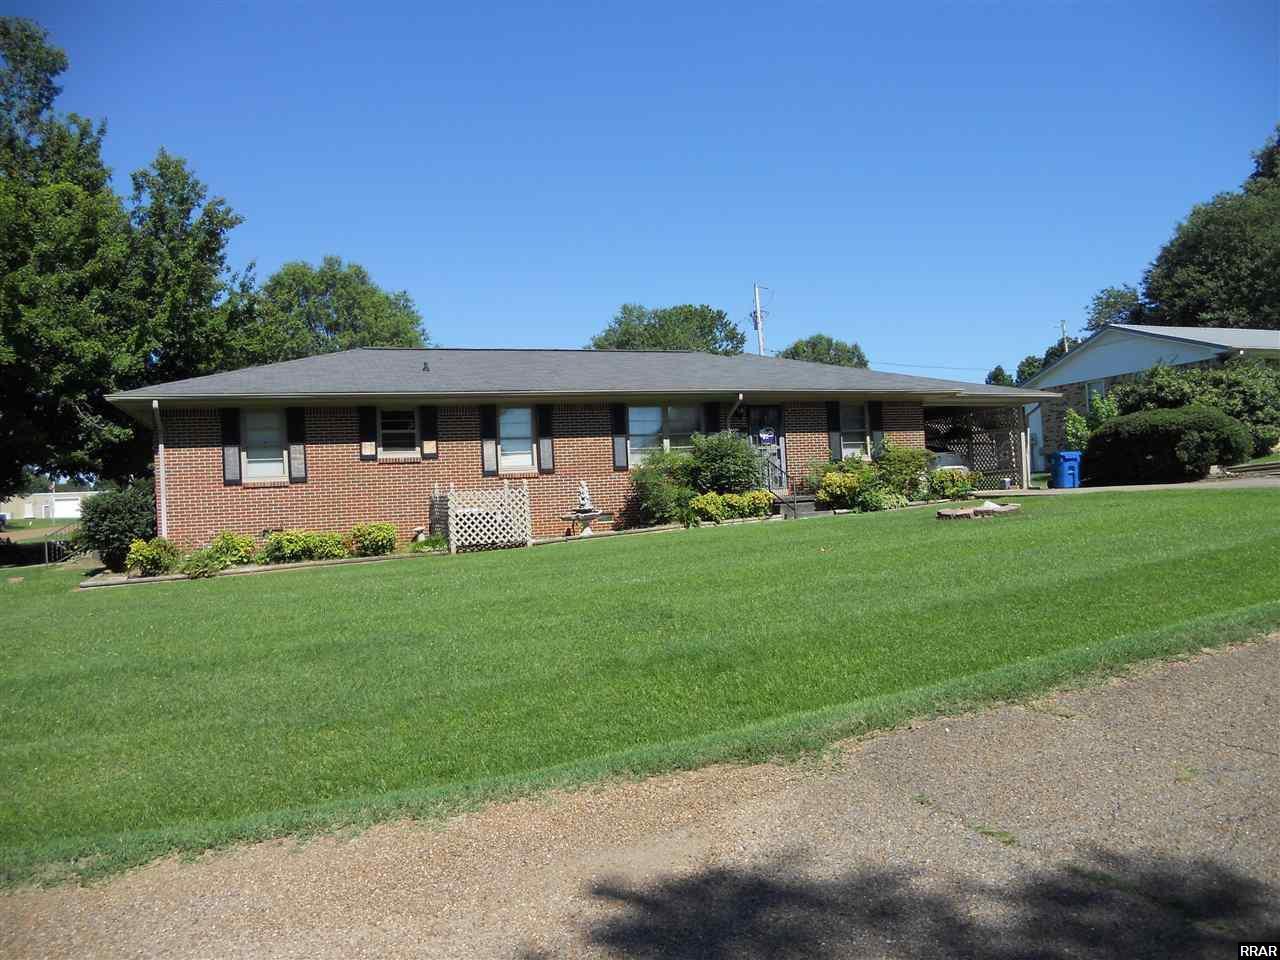 221 Circle Dr, South Fulton, TN 38257 - Multi-Family - MLS #39236 - 19  Photos | Trulia